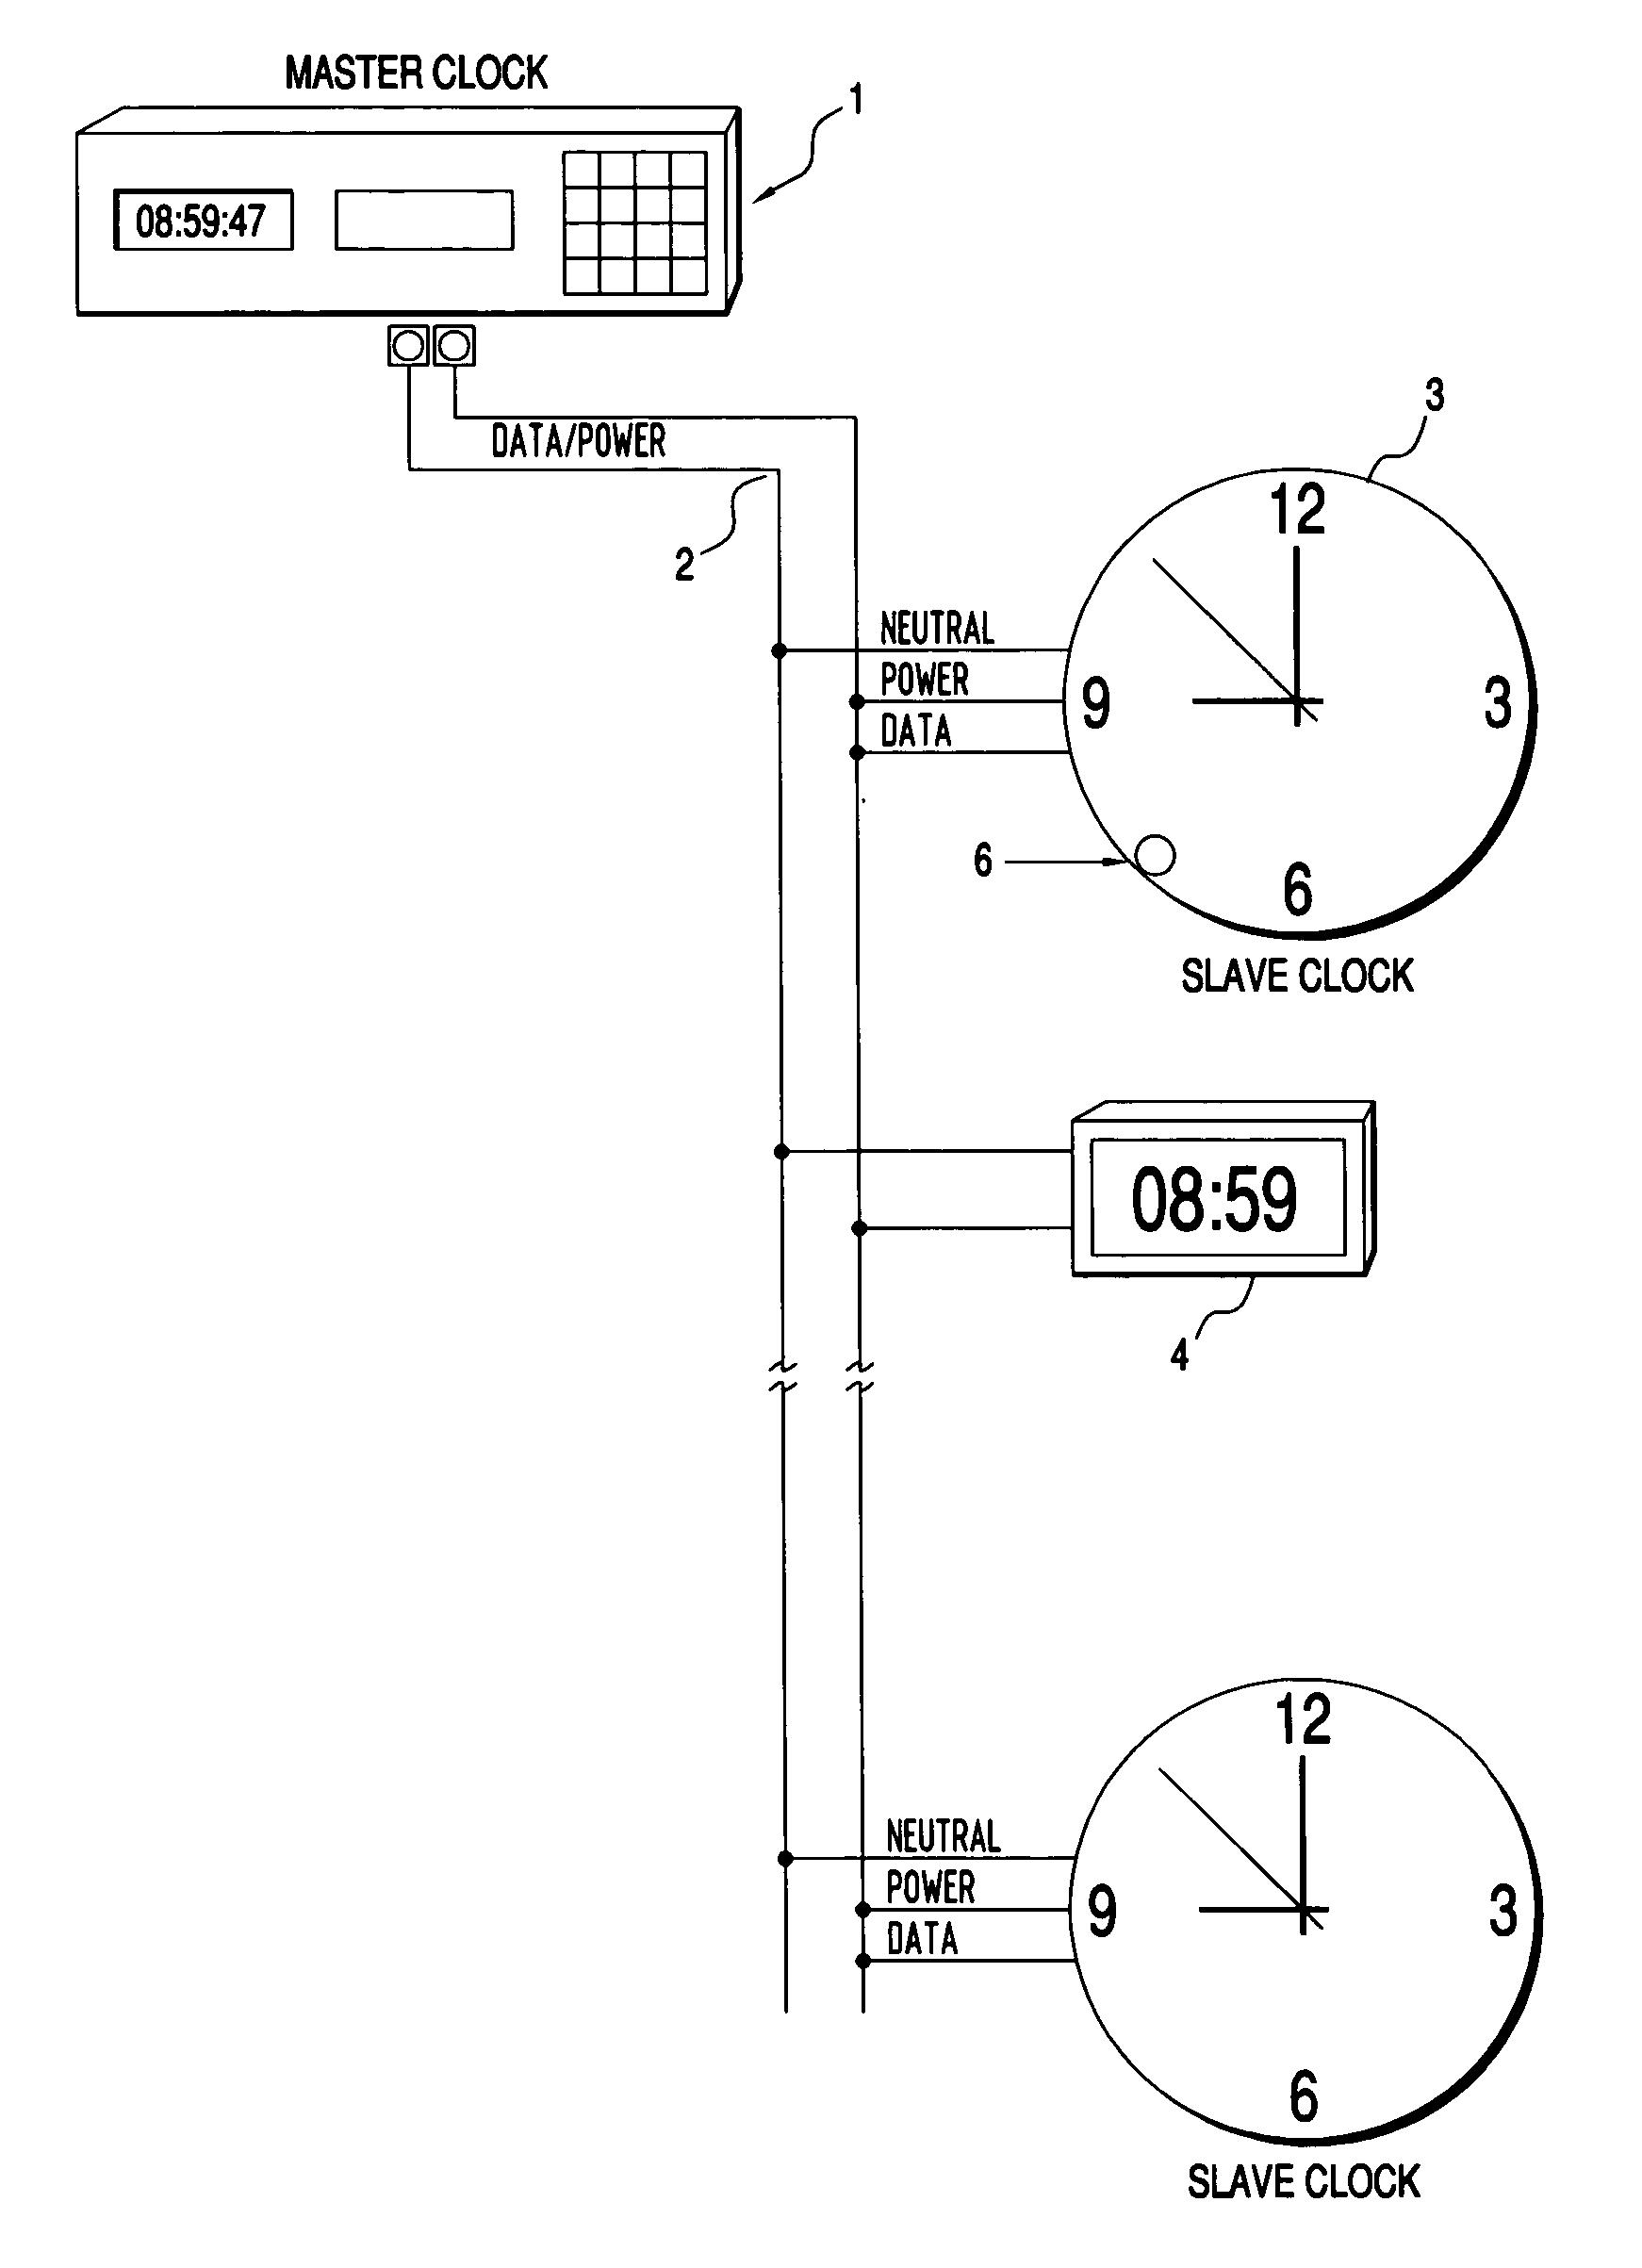 Master Clock System Wiring Diagram : 34 Wiring Diagram